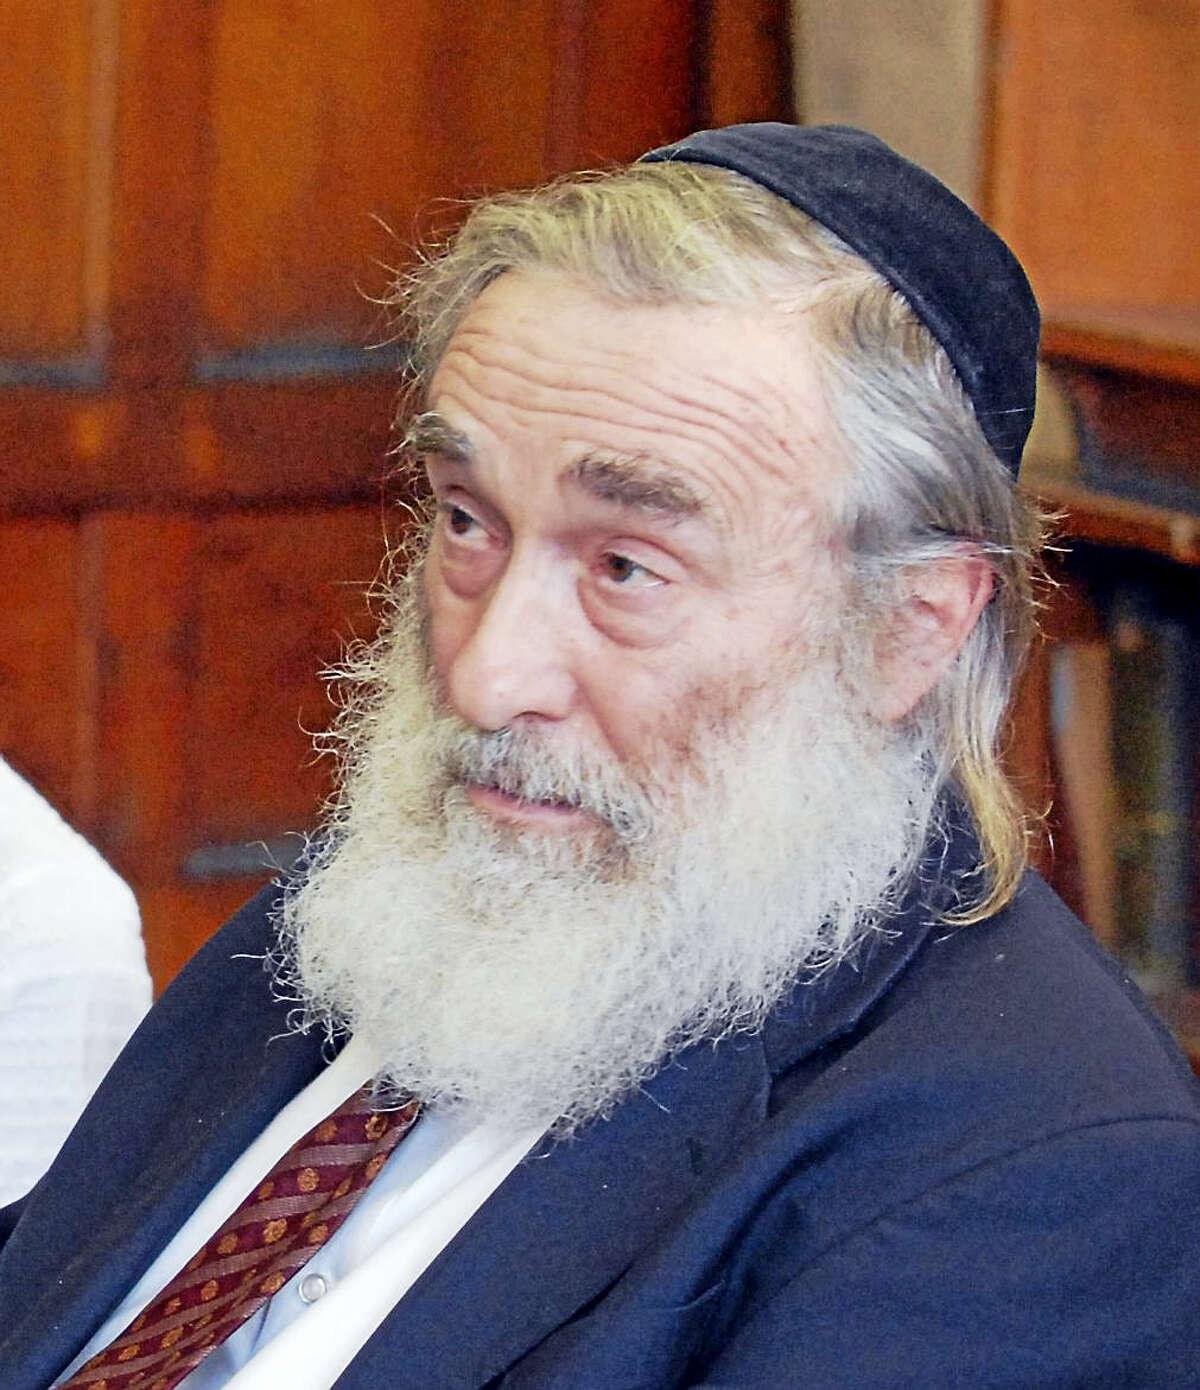 (File photo) At the Yeshiva of New Haven: Rabbi Daniel Greer